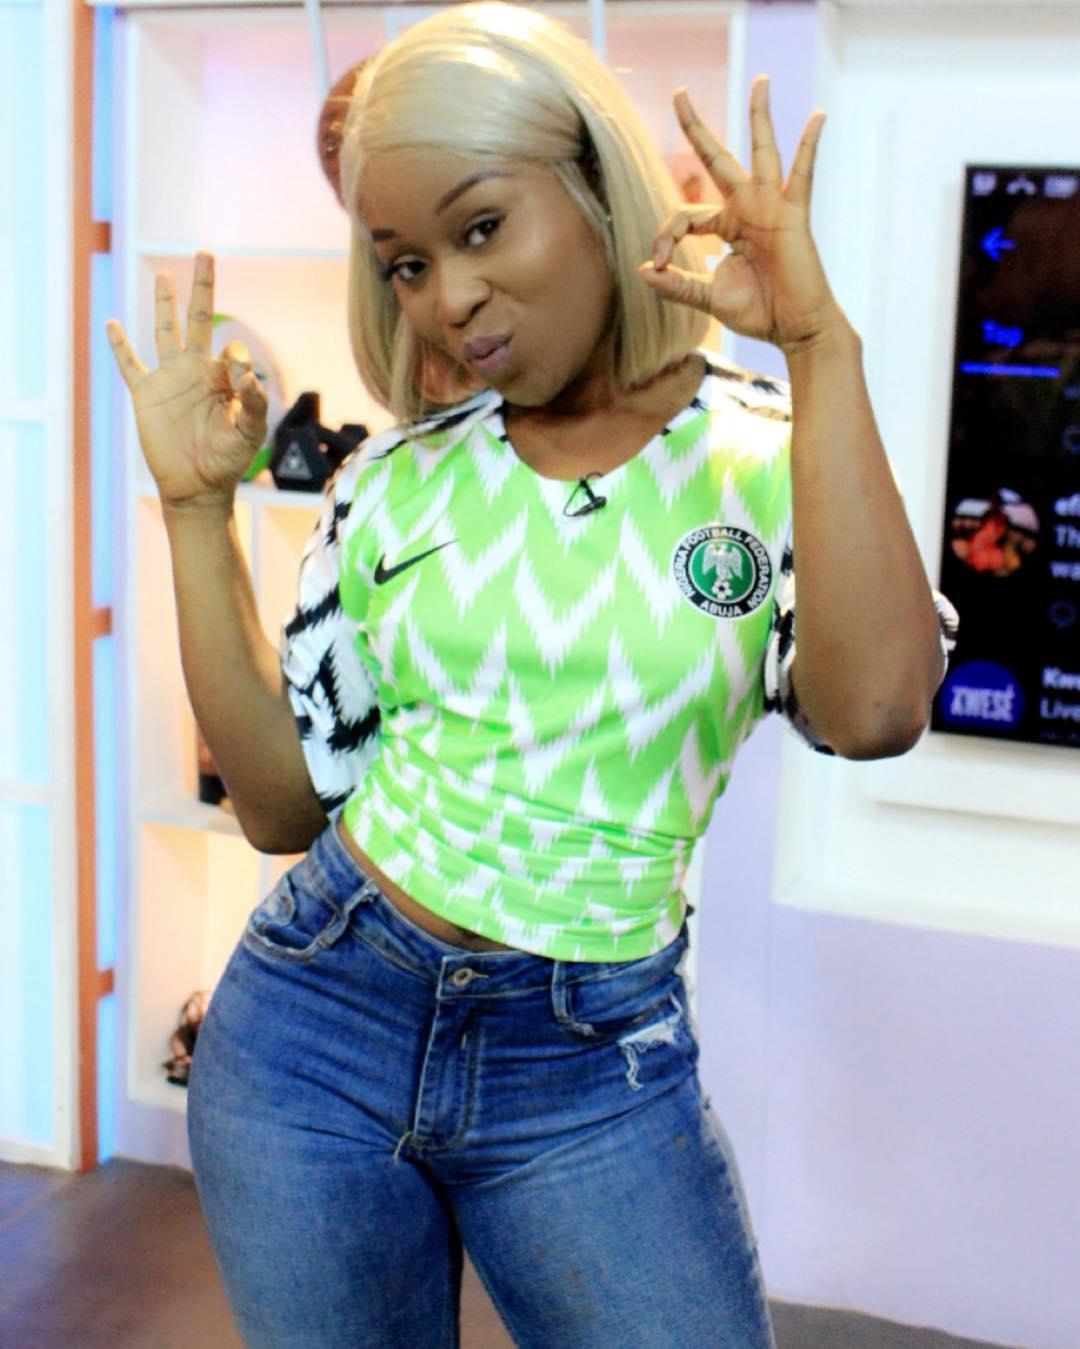 Efia Odo Rocking Super Eagles World Cup Jersey (2)